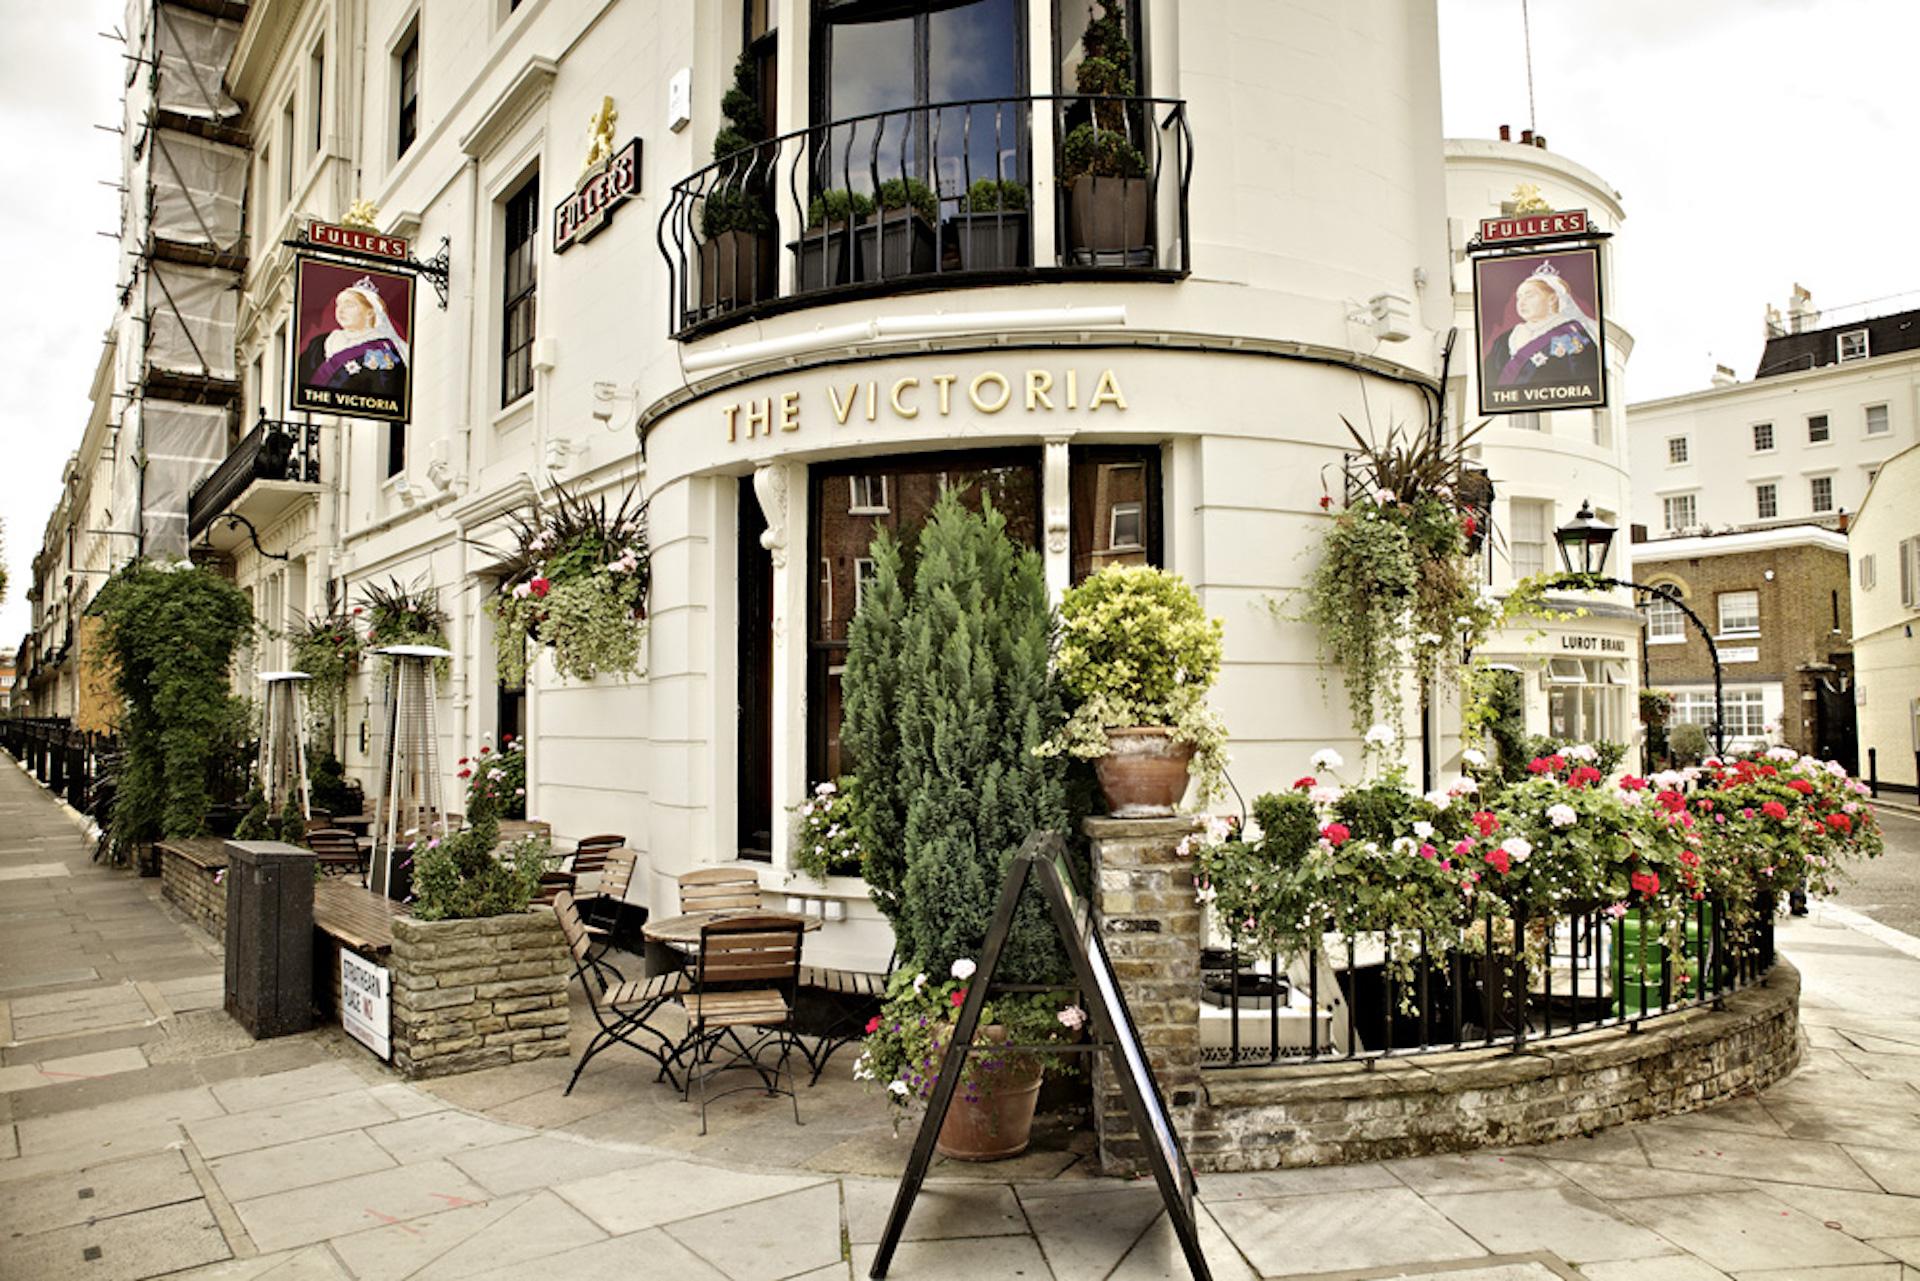 The Victoria Fullers Pub and Restaurant in Paddington